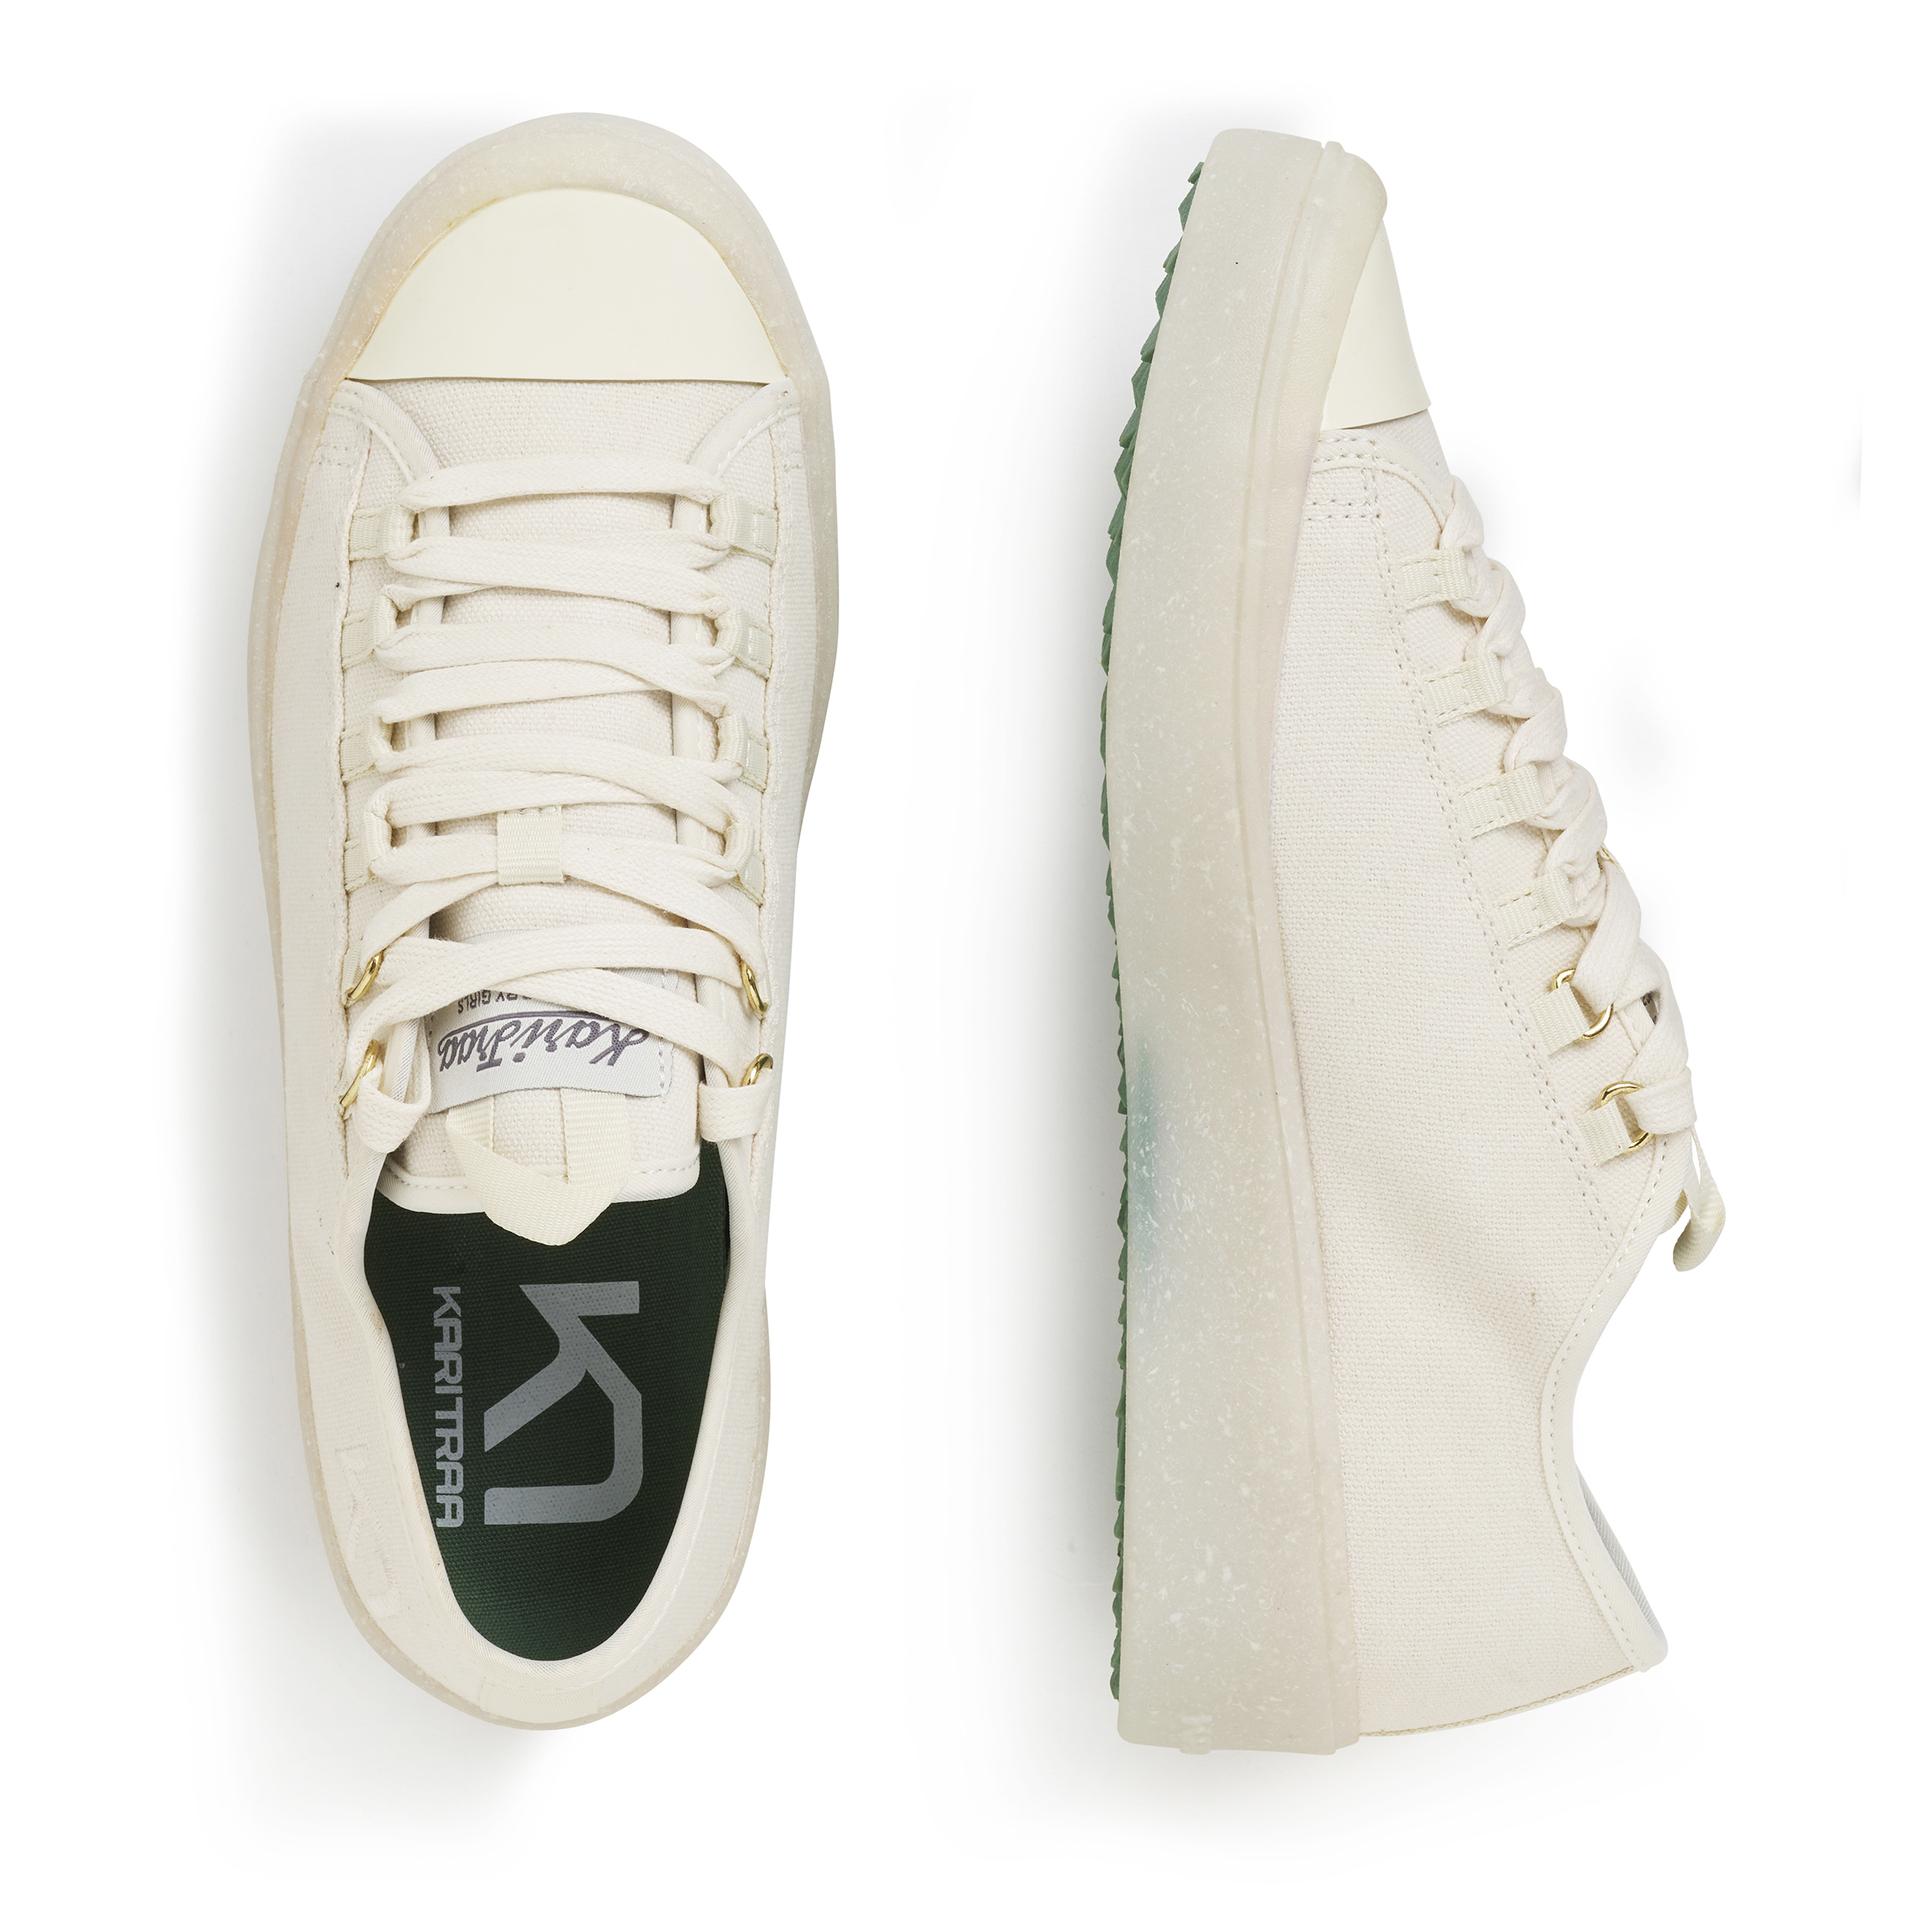 Kari Traa Sprade sko, nwhite, 38